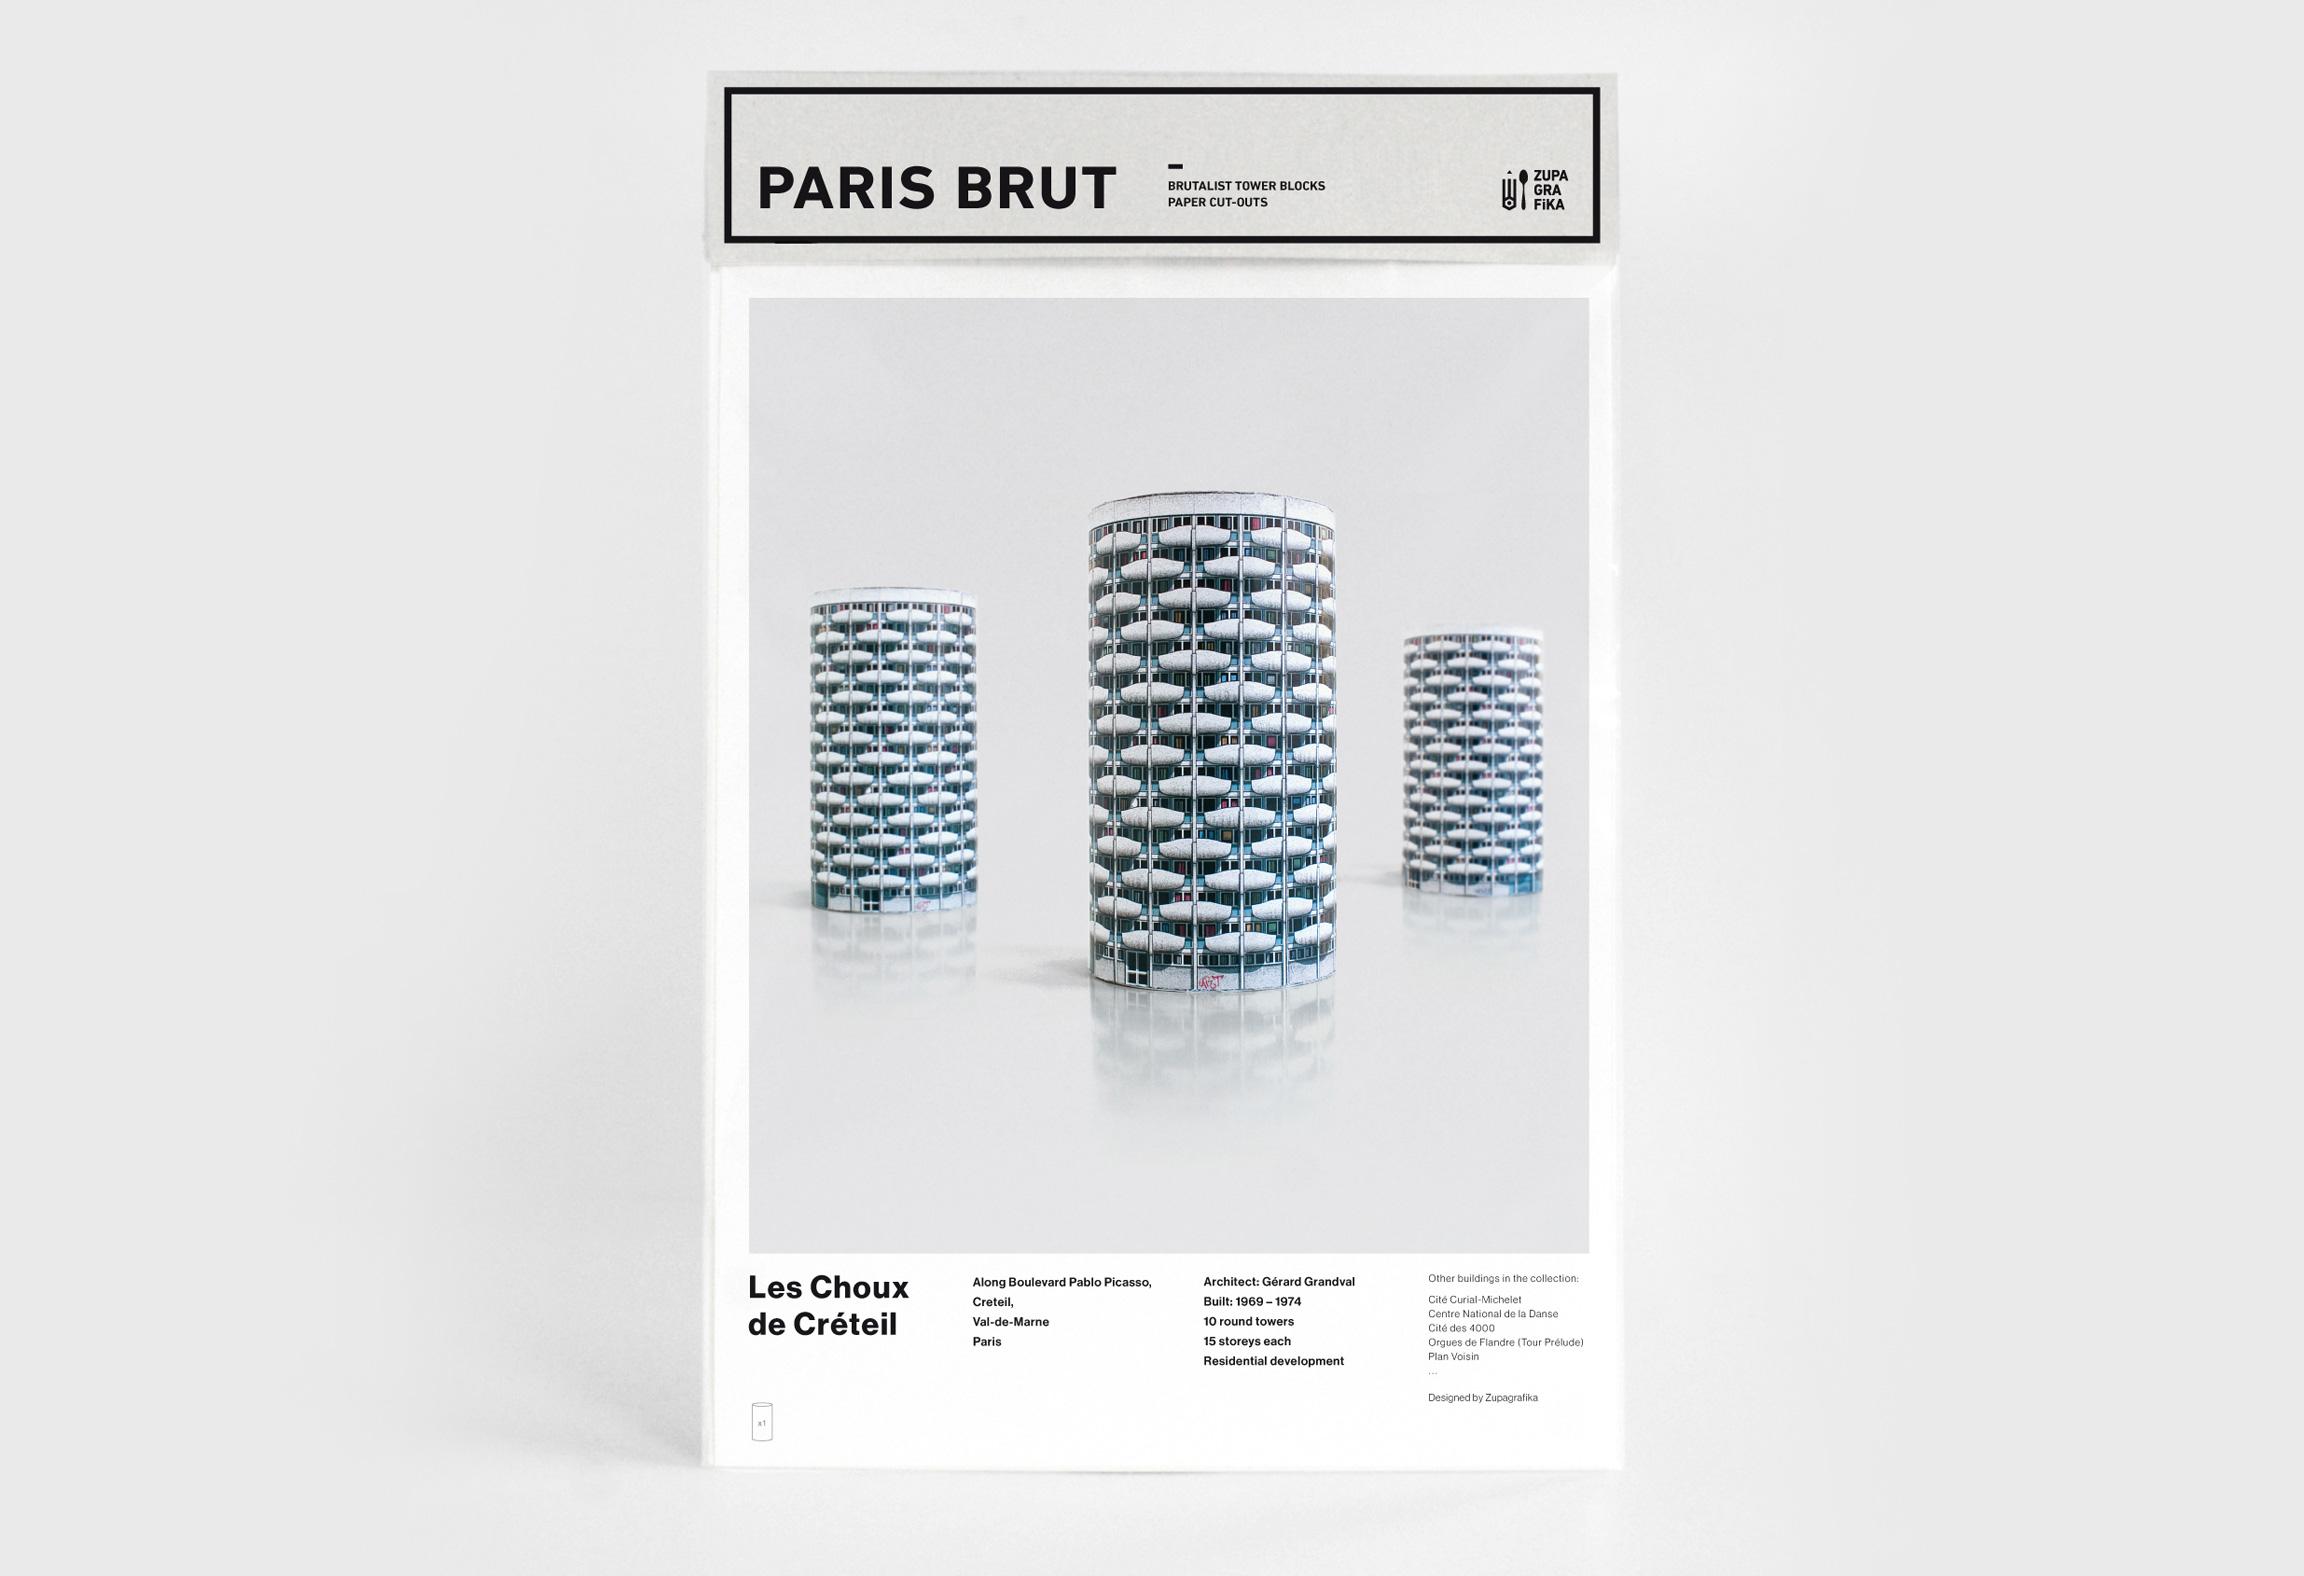 ParisBrutSetx5